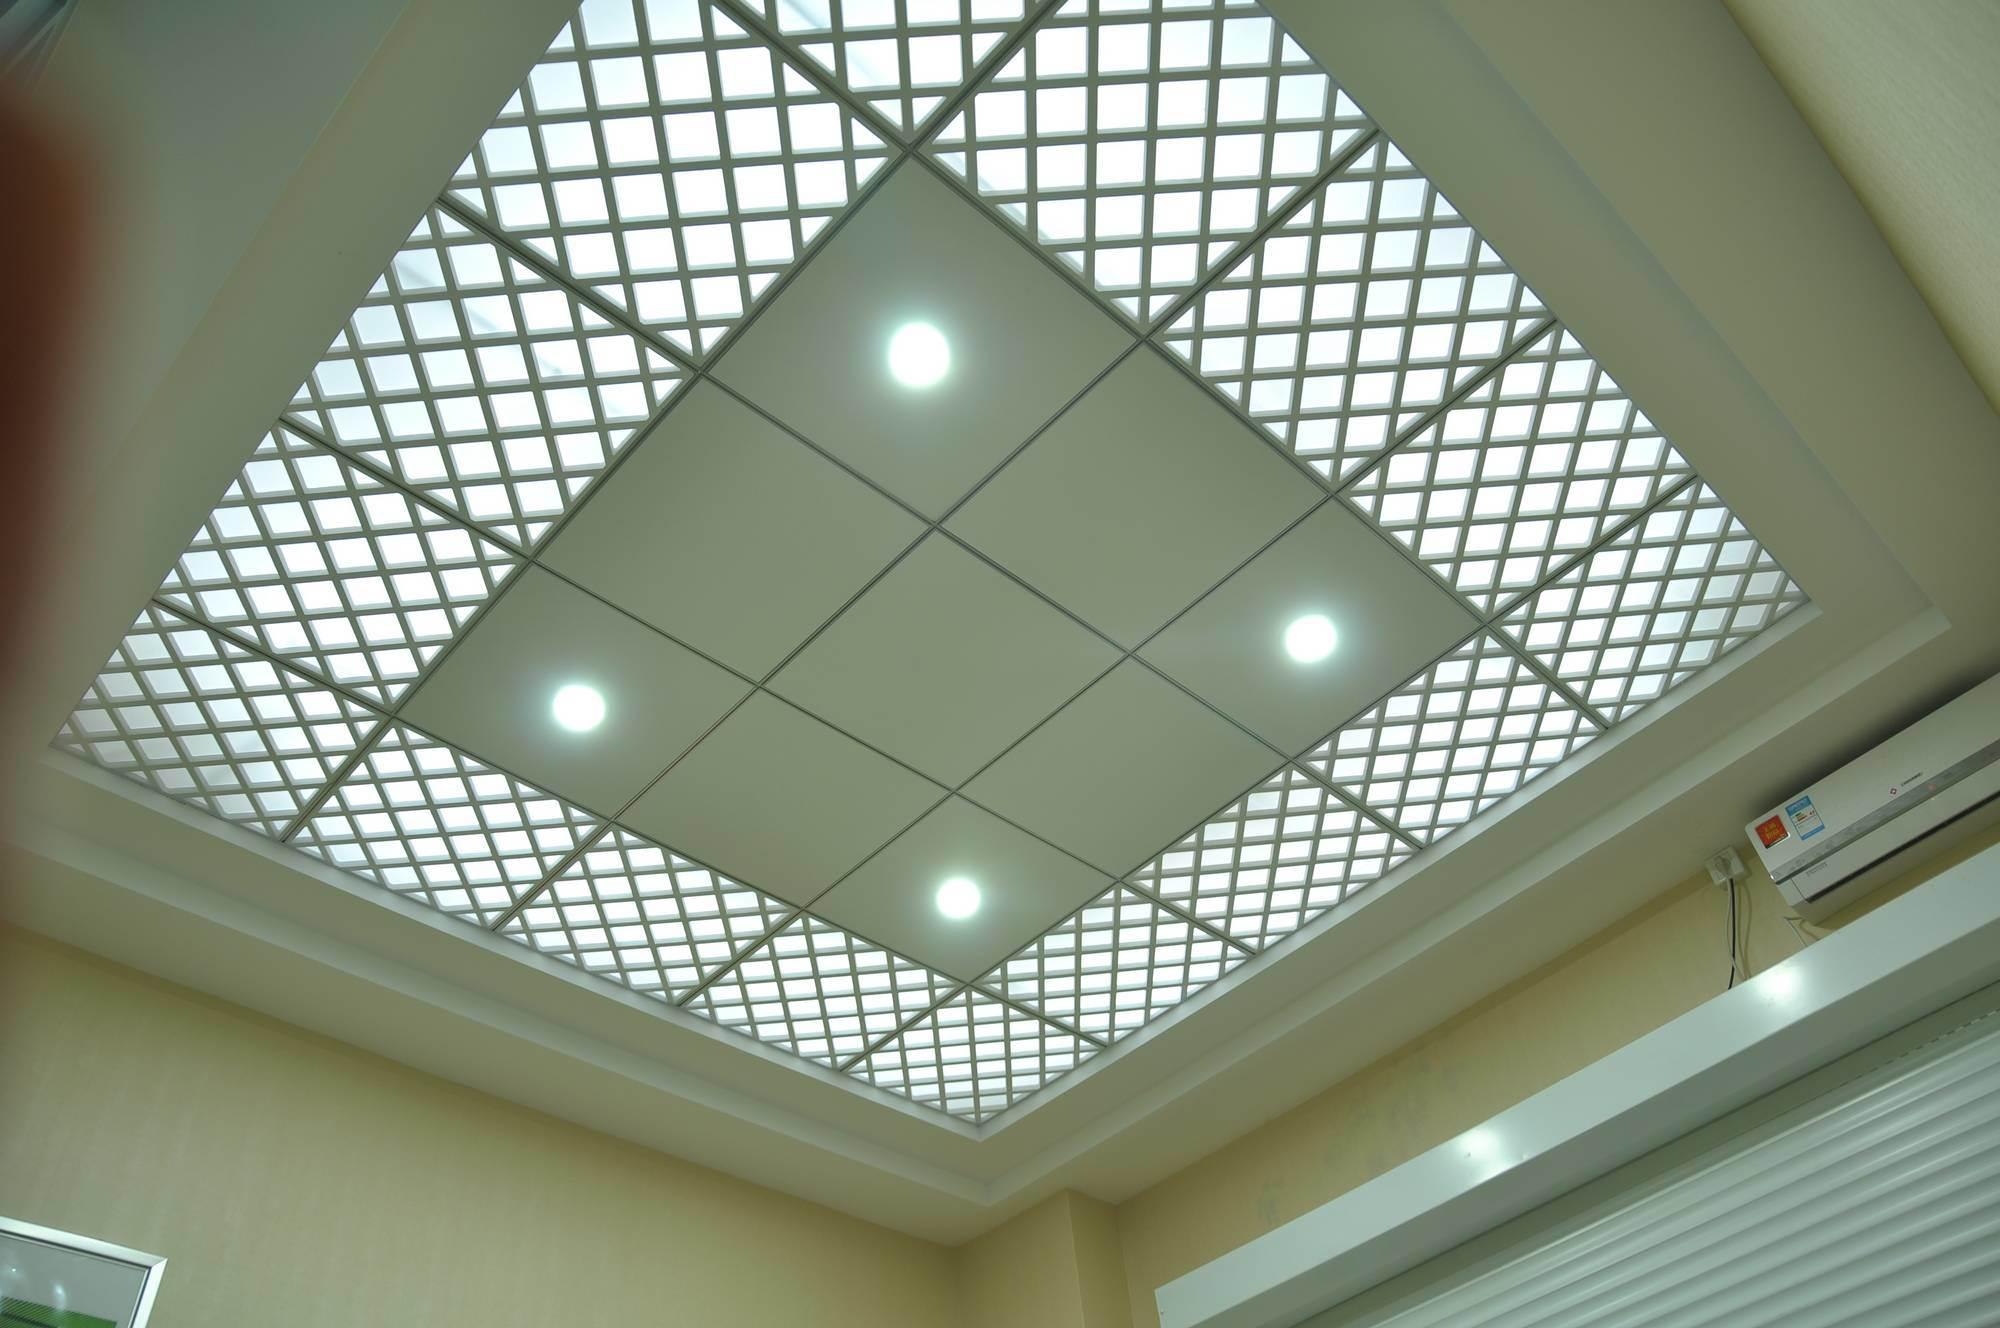 Pvc gypsum ceiling tiles imageseap pvc gypsum gypsum ceiling gypsum ceiling tile images dailygadgetfo Gallery